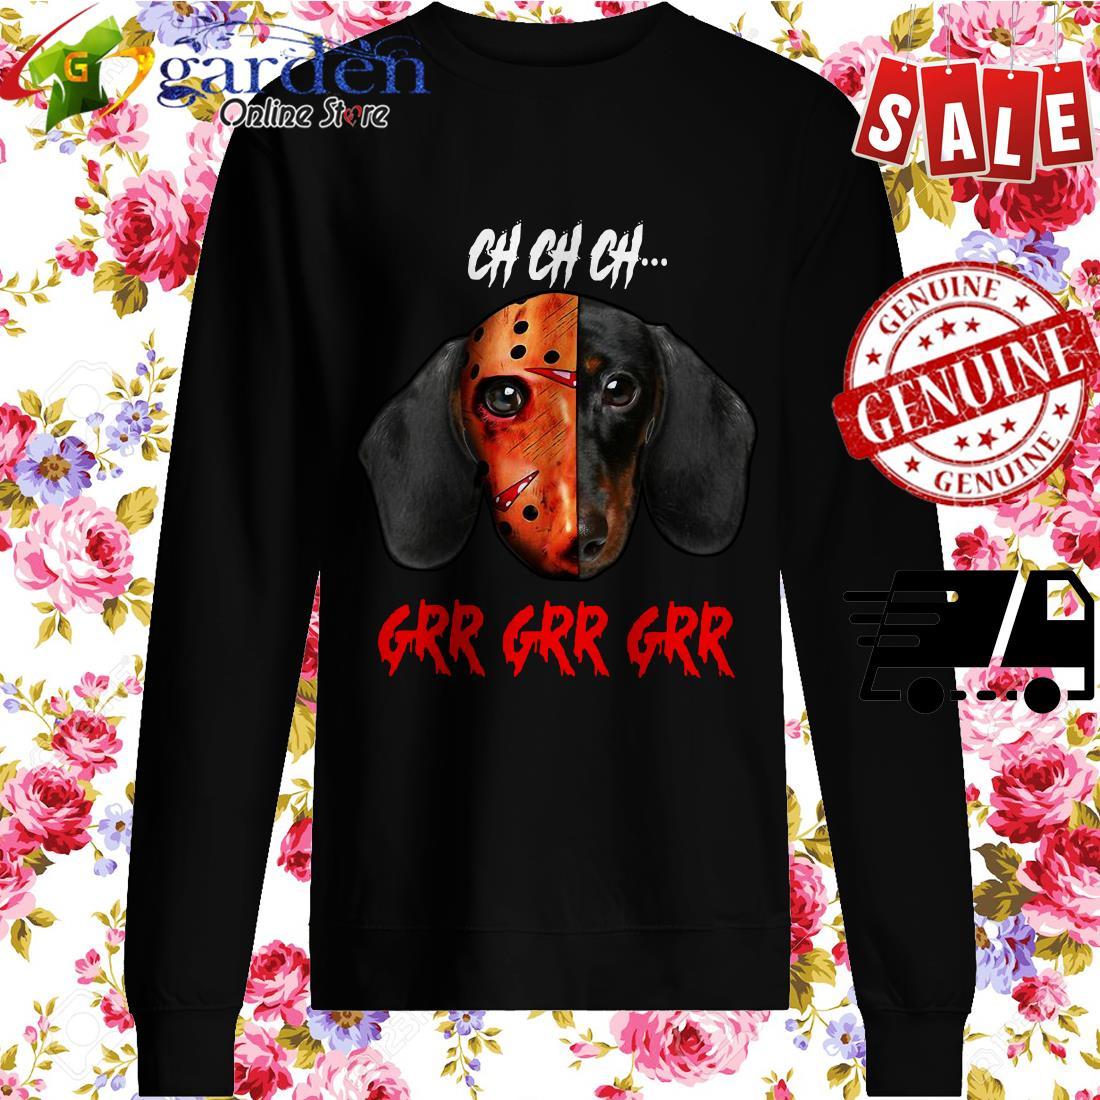 Jason Voorhees Dachshund Ch Ch Ch Grr Grr Grr sweater